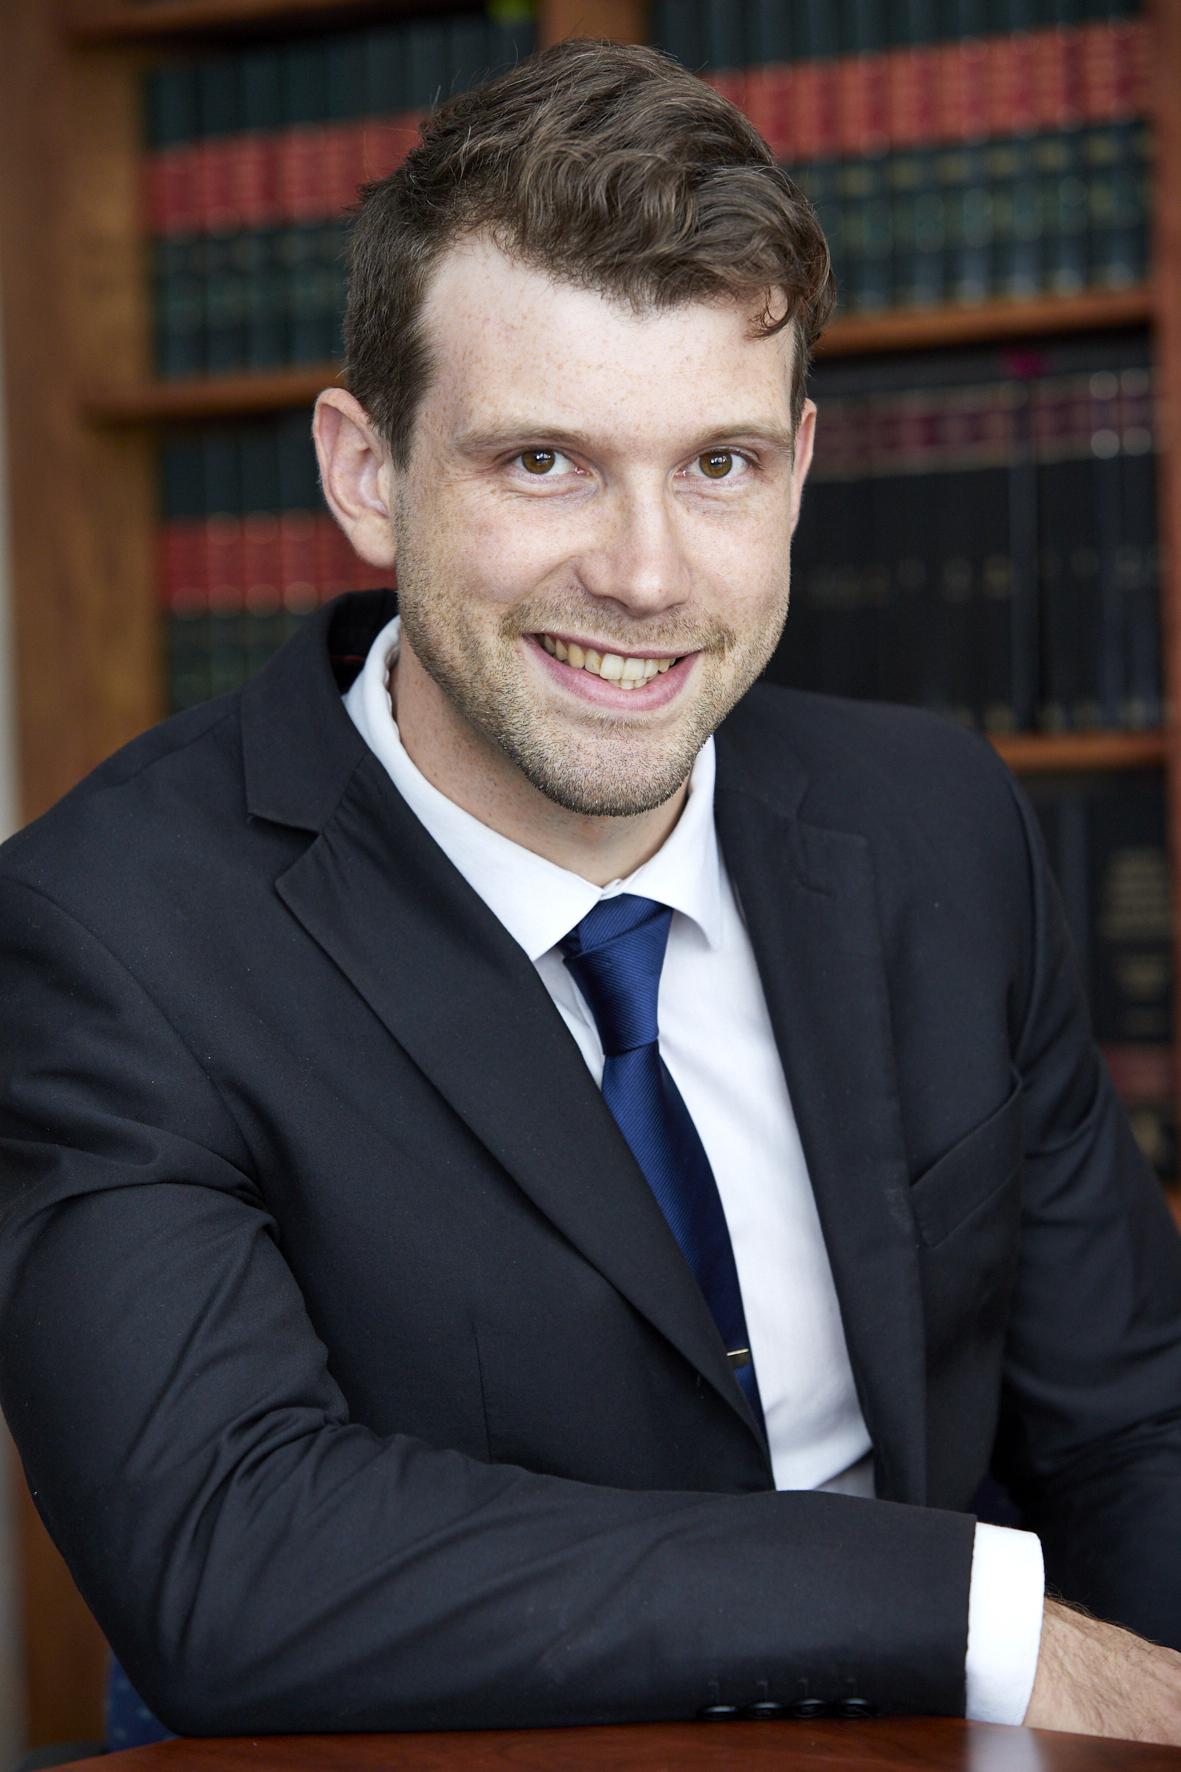 Picture of Benjamin Prinsloo